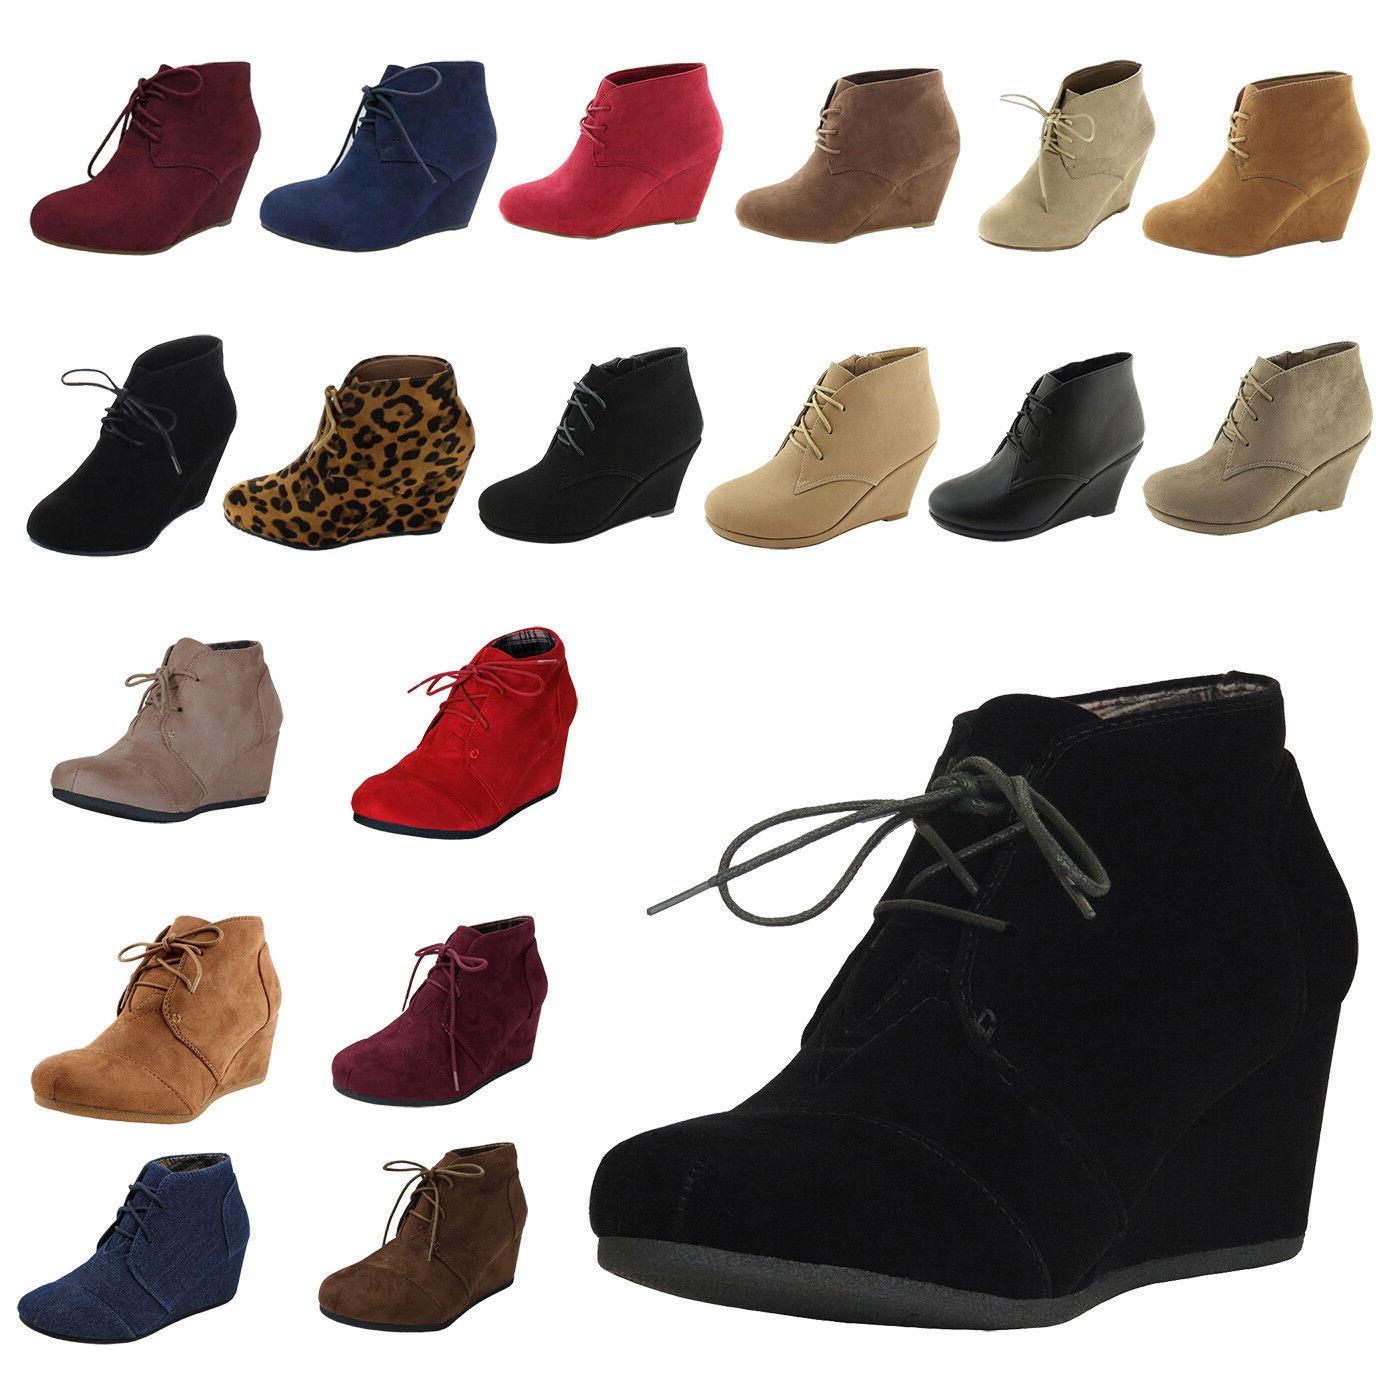 new womens wedge booties oxford high heels